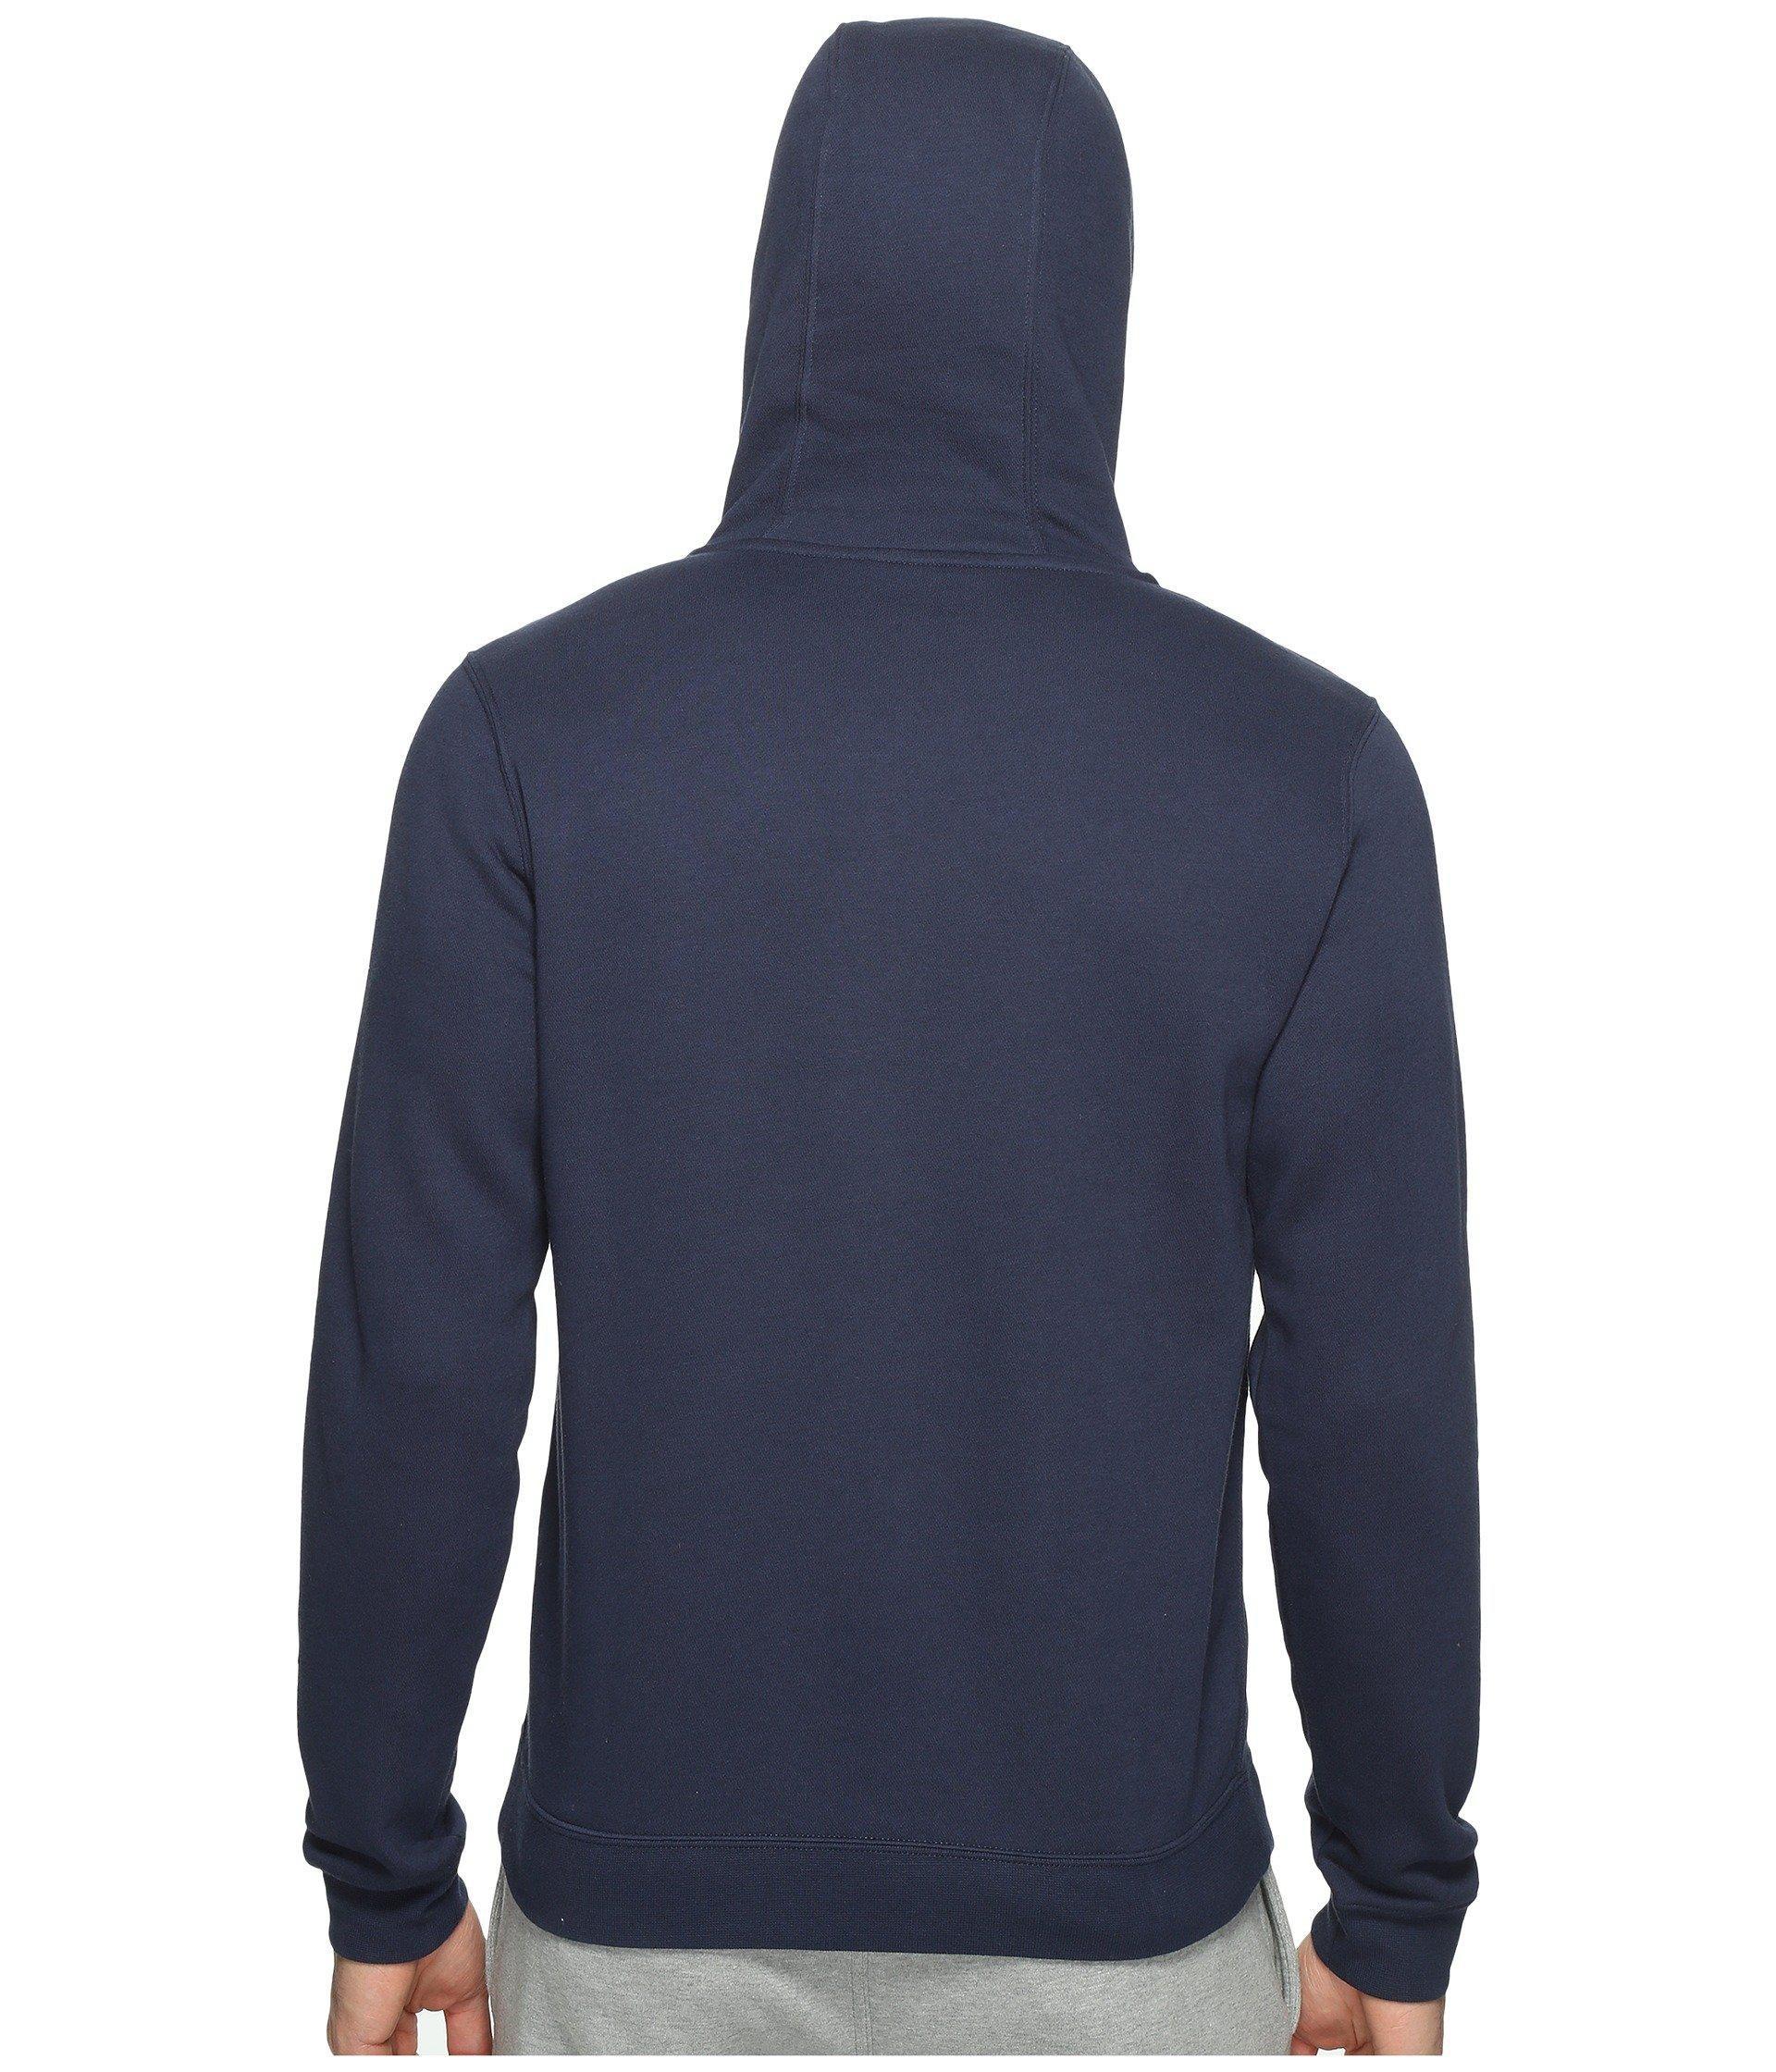 b721cc73ad5d Nike - Blue Club Fleece Full-zip Hoodie (charcoal Heather charcoal  Heather . View fullscreen